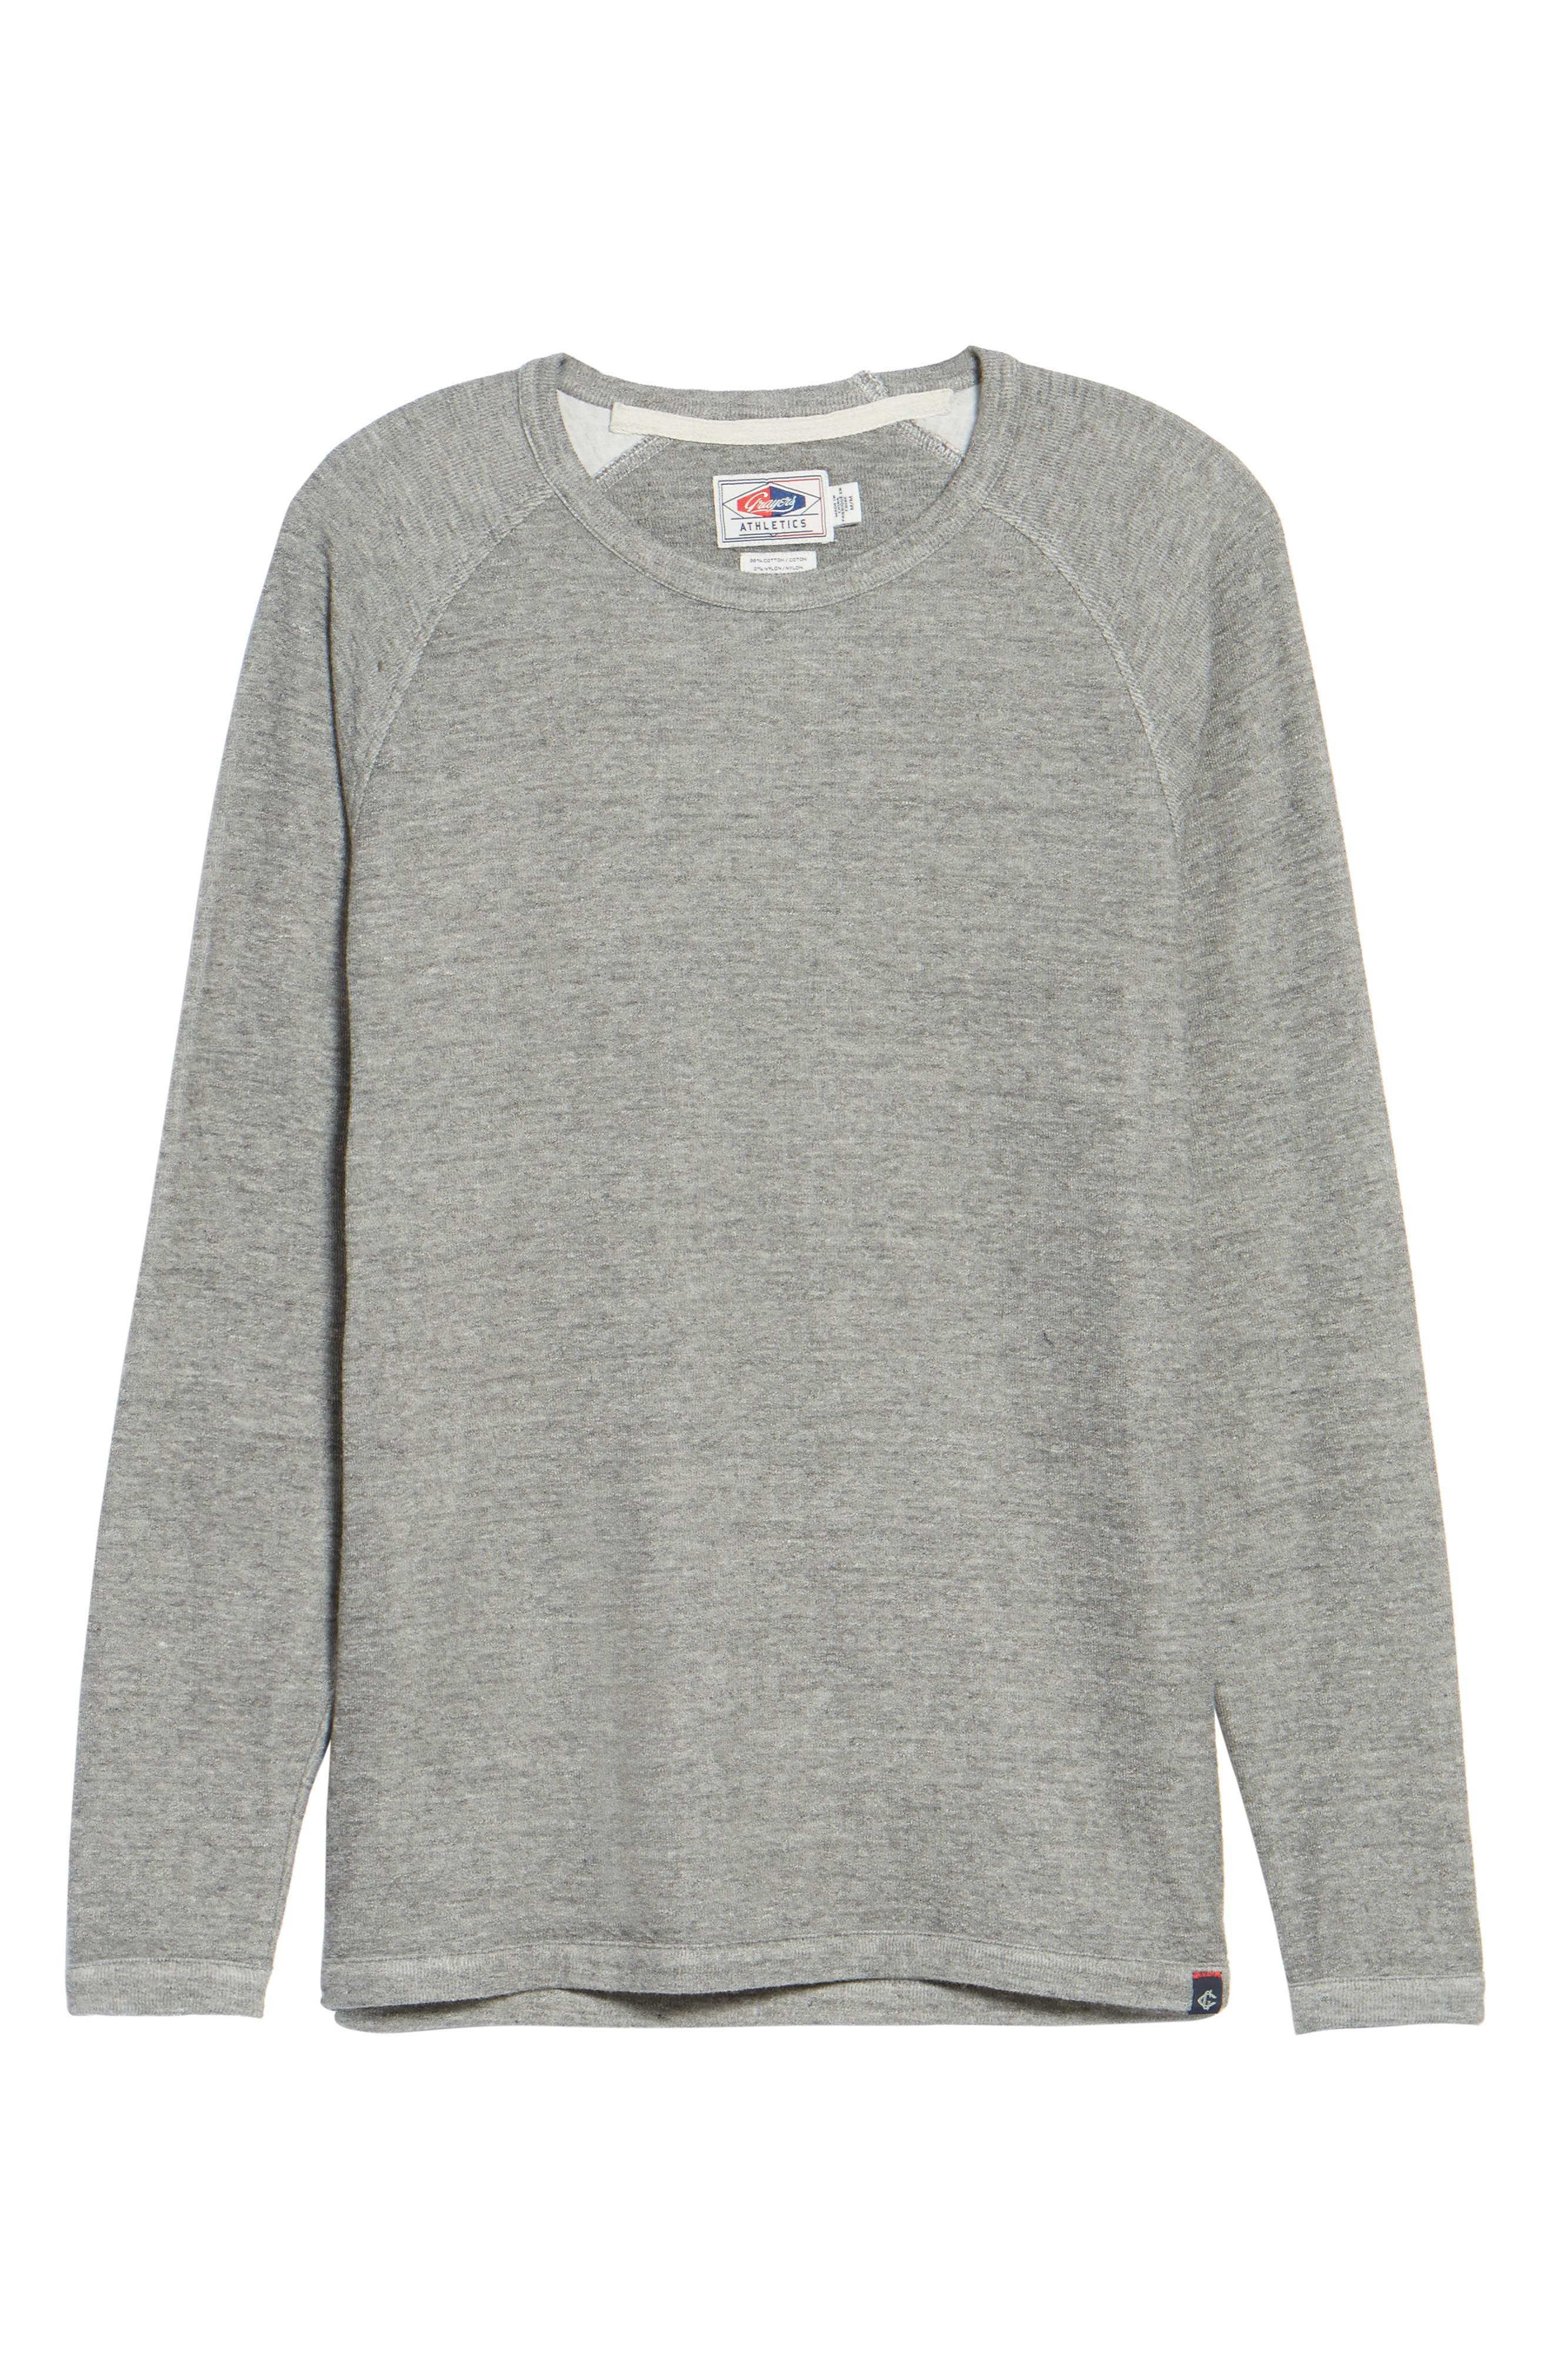 Jensen Double Cloth Crewneck Shirt,                             Alternate thumbnail 6, color,                             Grey